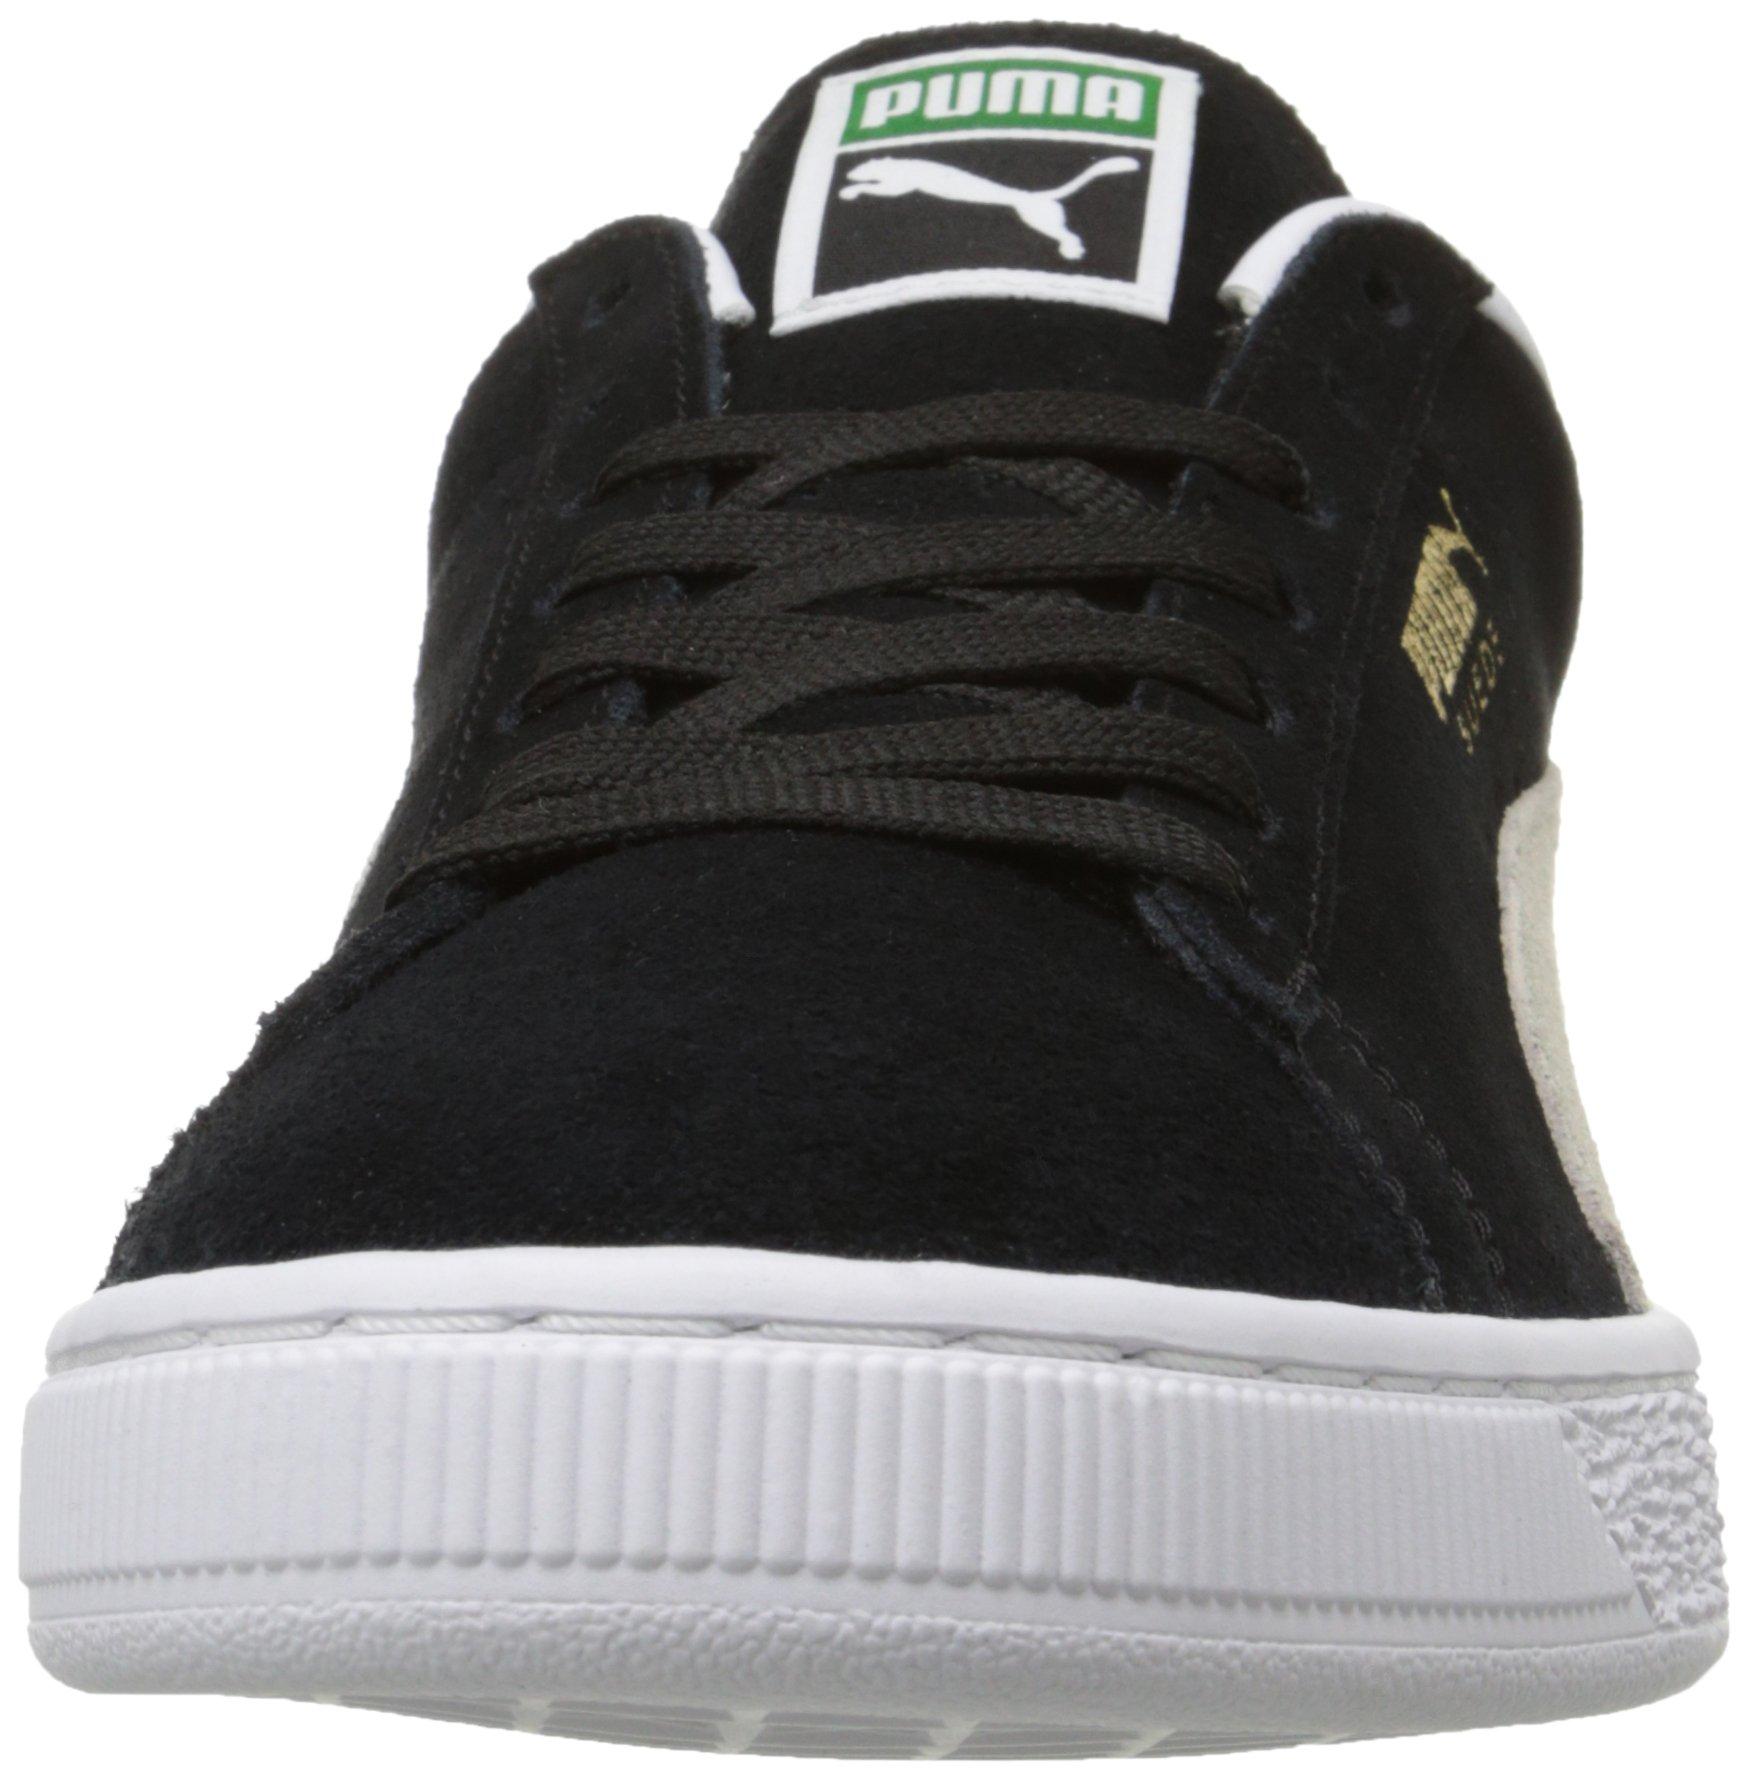 PUMA Suede Classic Sneaker,Black/White,9.5 M US Men's by PUMA (Image #8)